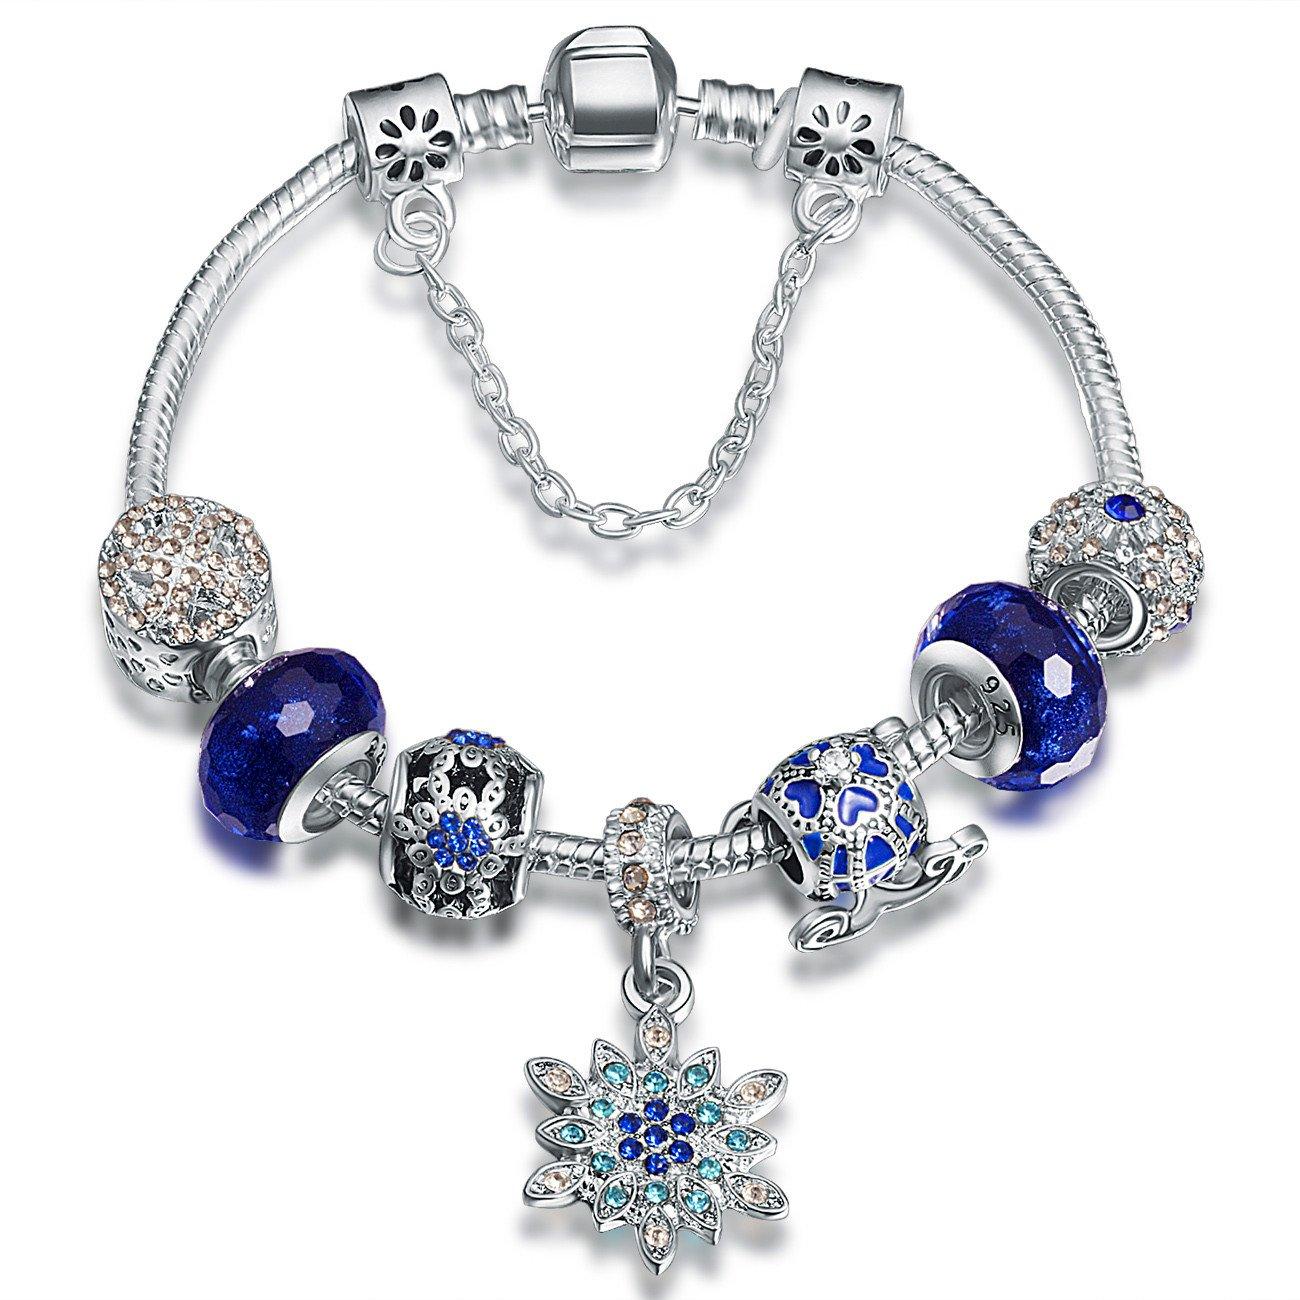 ATE Charm Bracelet Crystal Murano Glass Beads Women Gifts JW-B180 (Blue3)